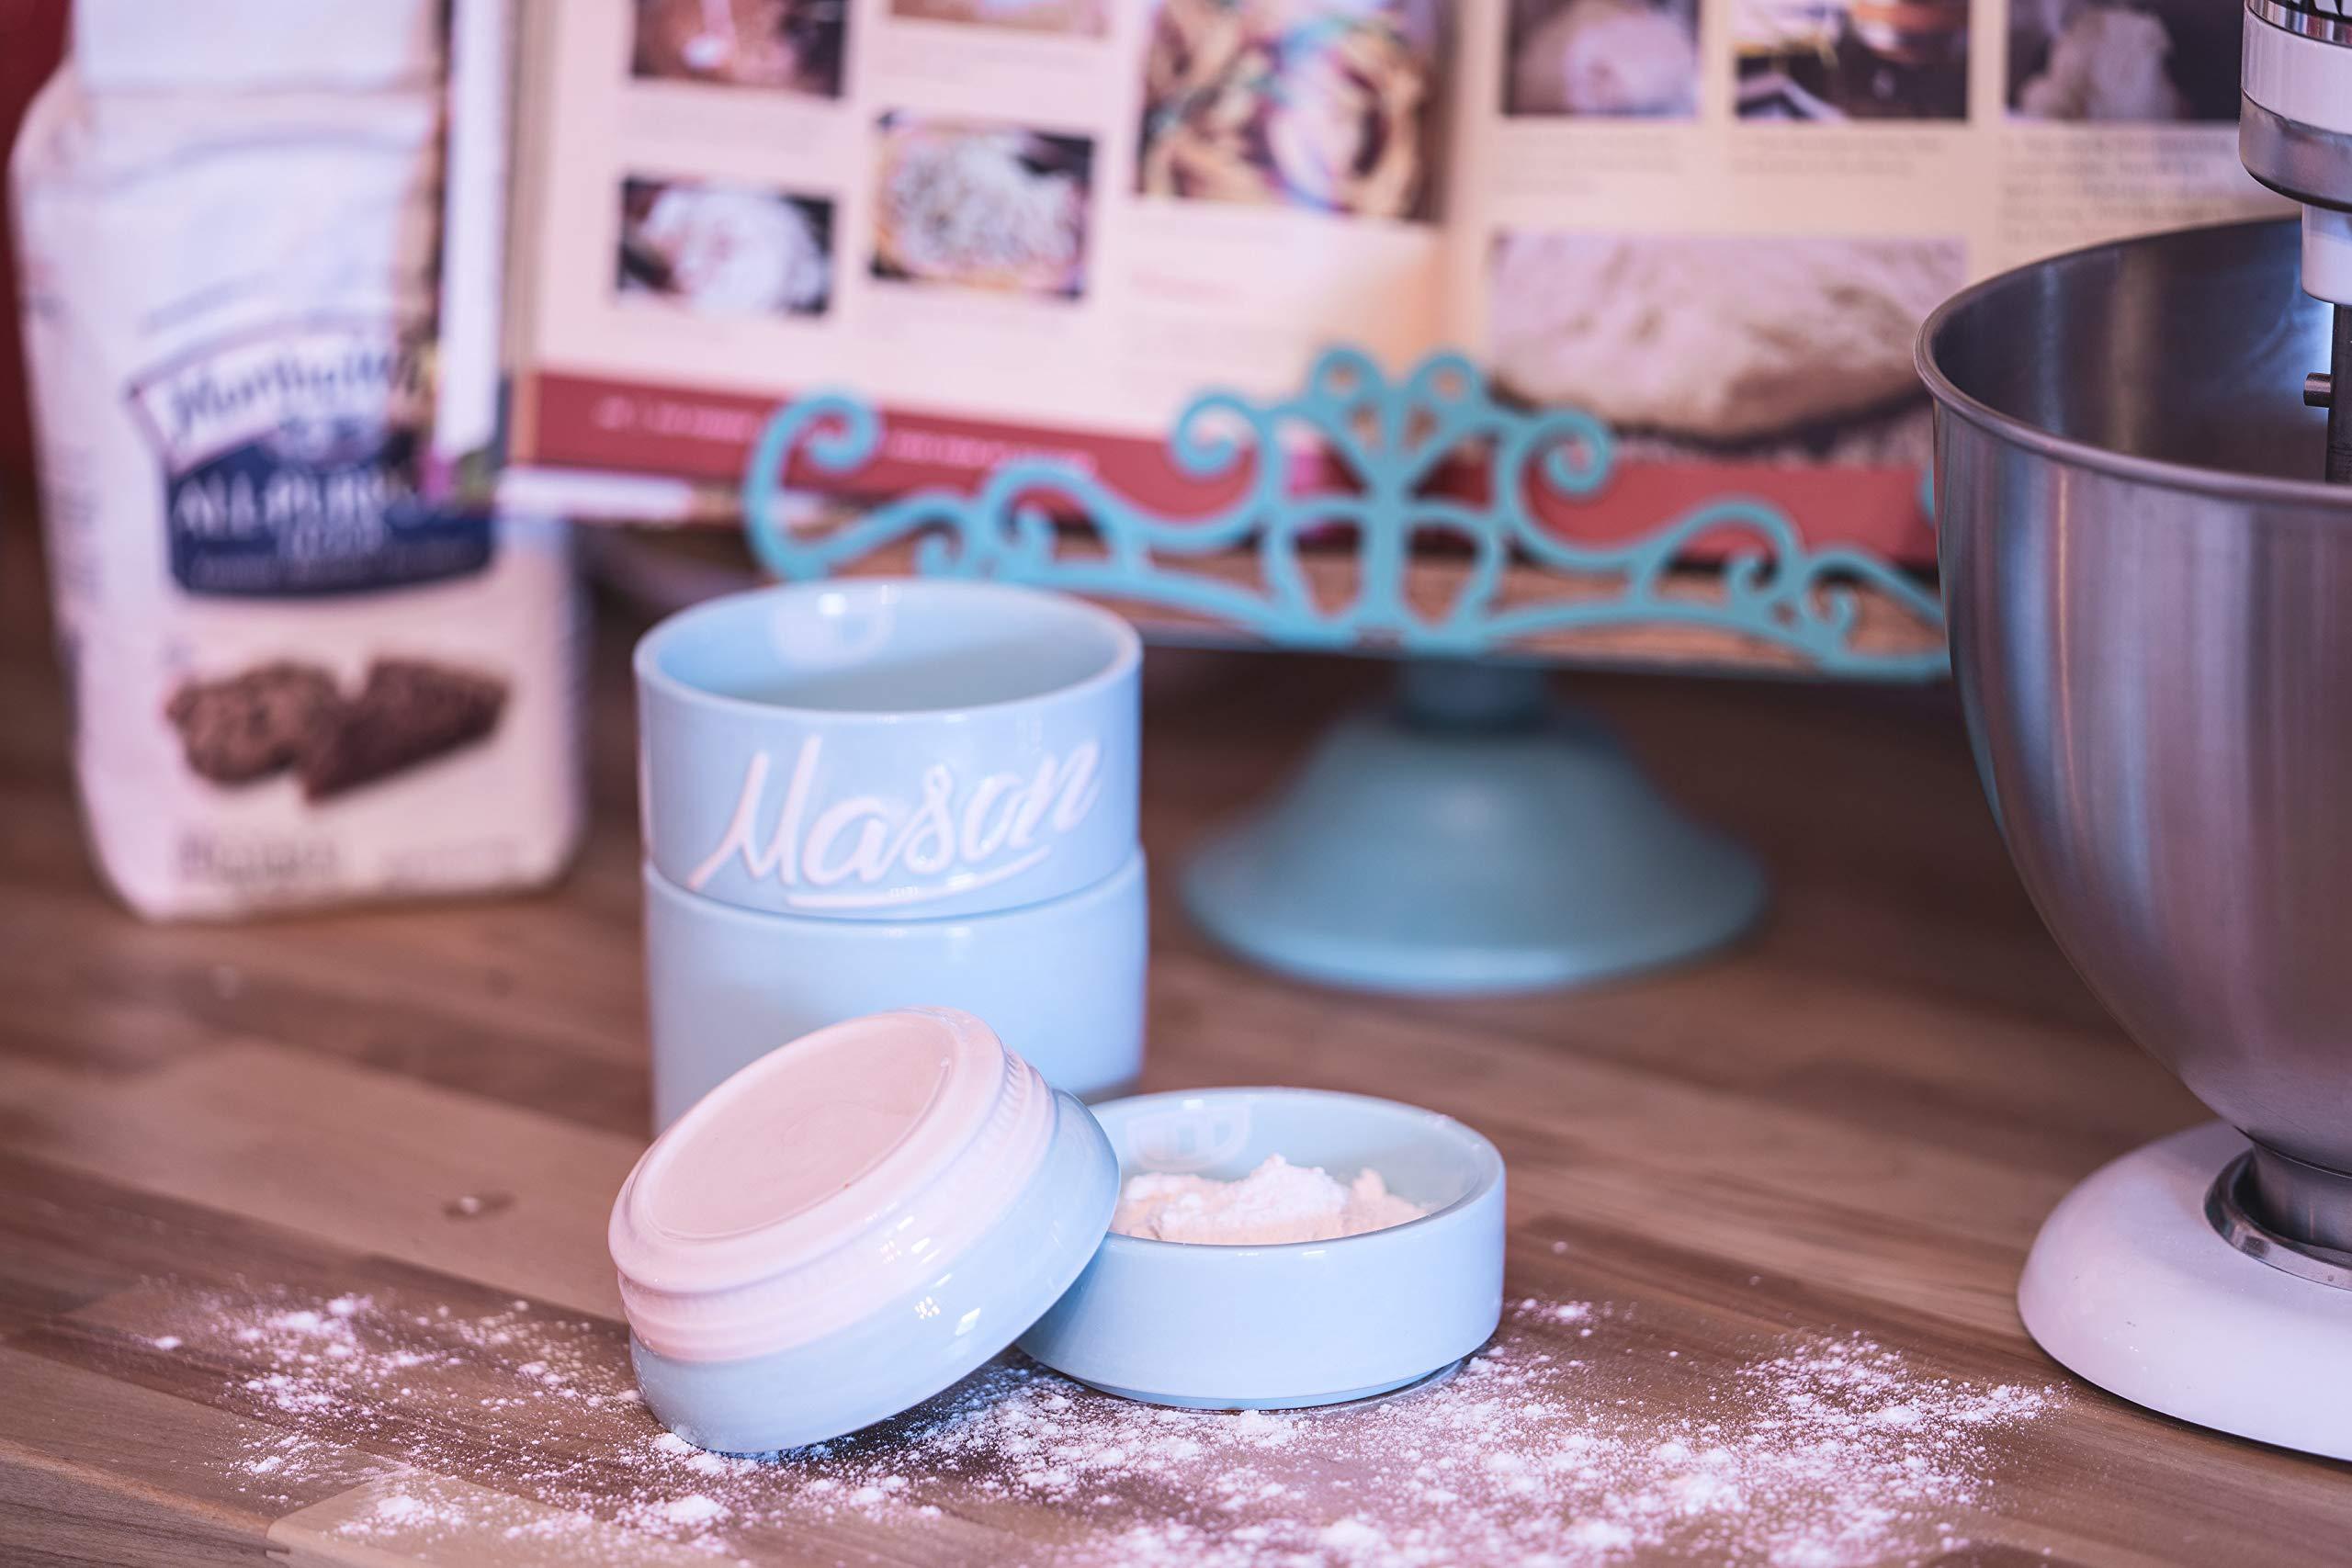 Blue Ceramic Kitchen Mason Jars   3 Piece Vintage Kitchenware Set    Measuring Cups, Measuring Spoons, Spoon Rest | Retro Farmhouse Decor |  Baking Supplies, ...